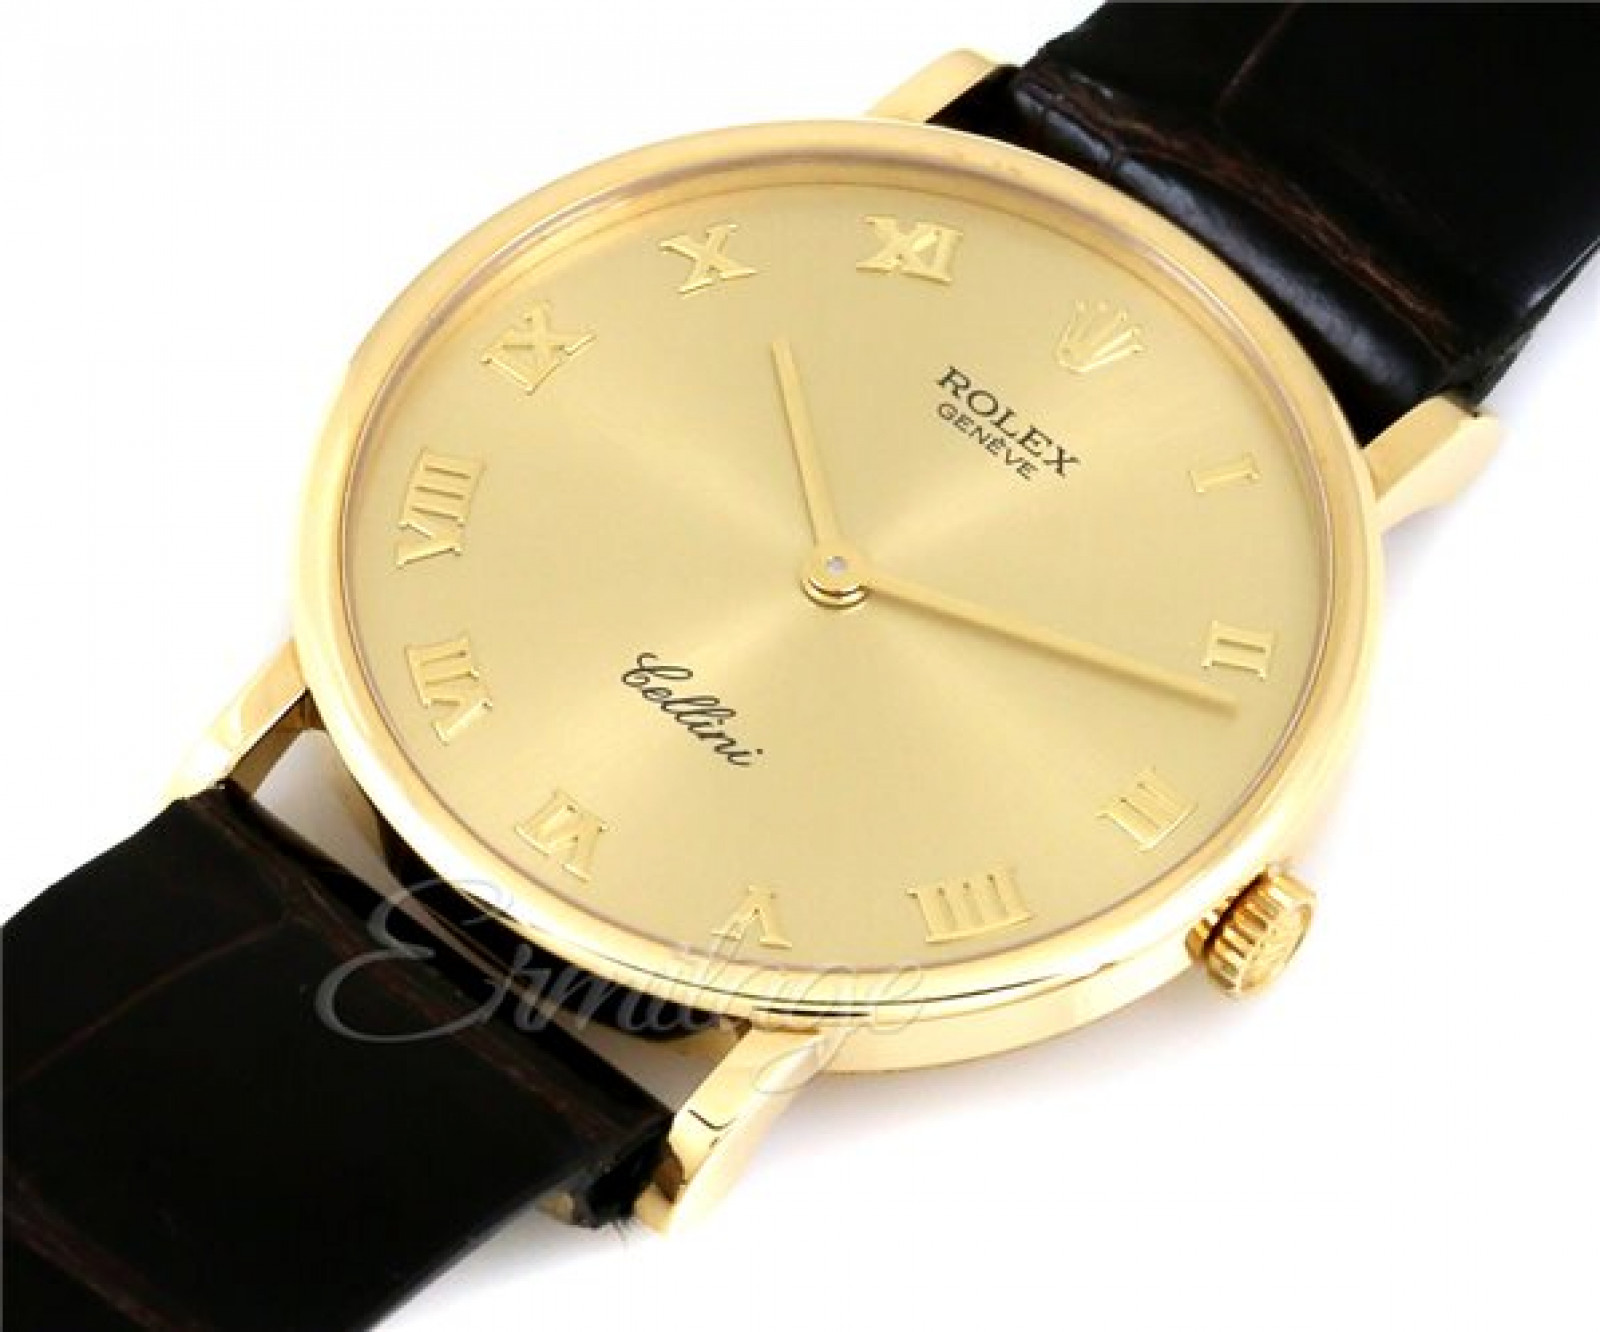 Rolex Cellini 5112 Gold Year 2000